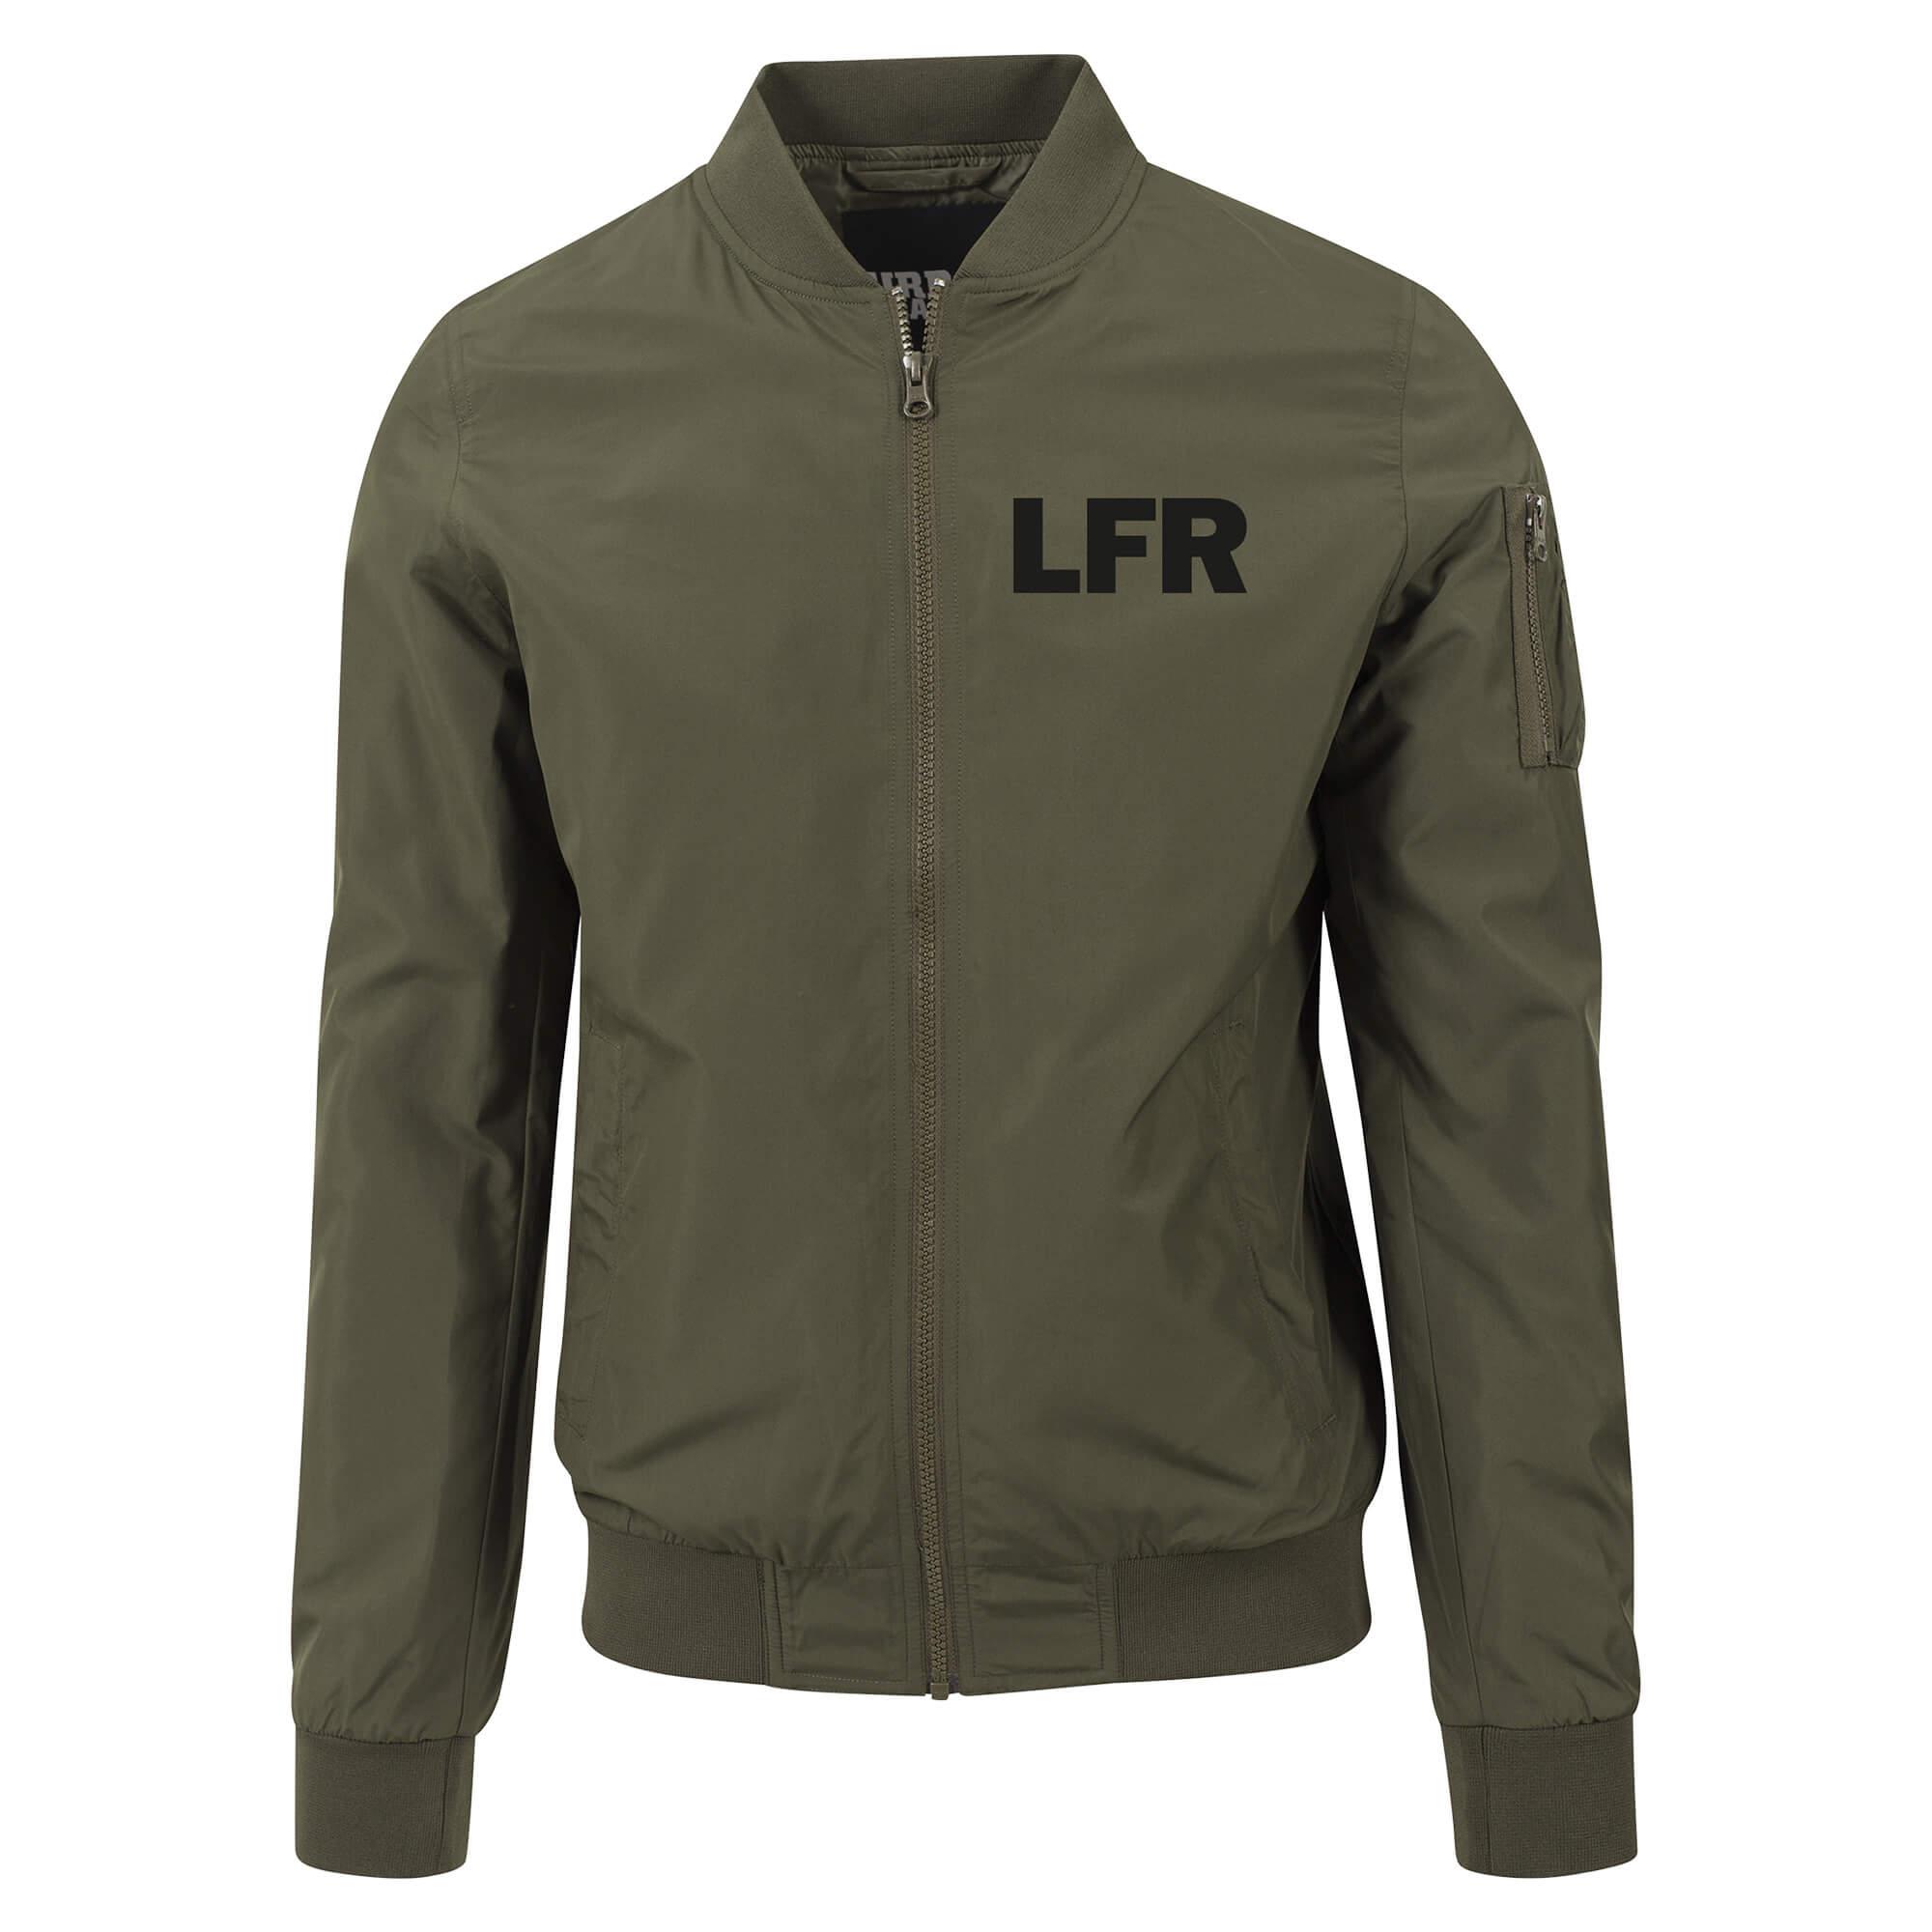 LFR von Nimo - Light Bomber jetzt im Bravado Shop